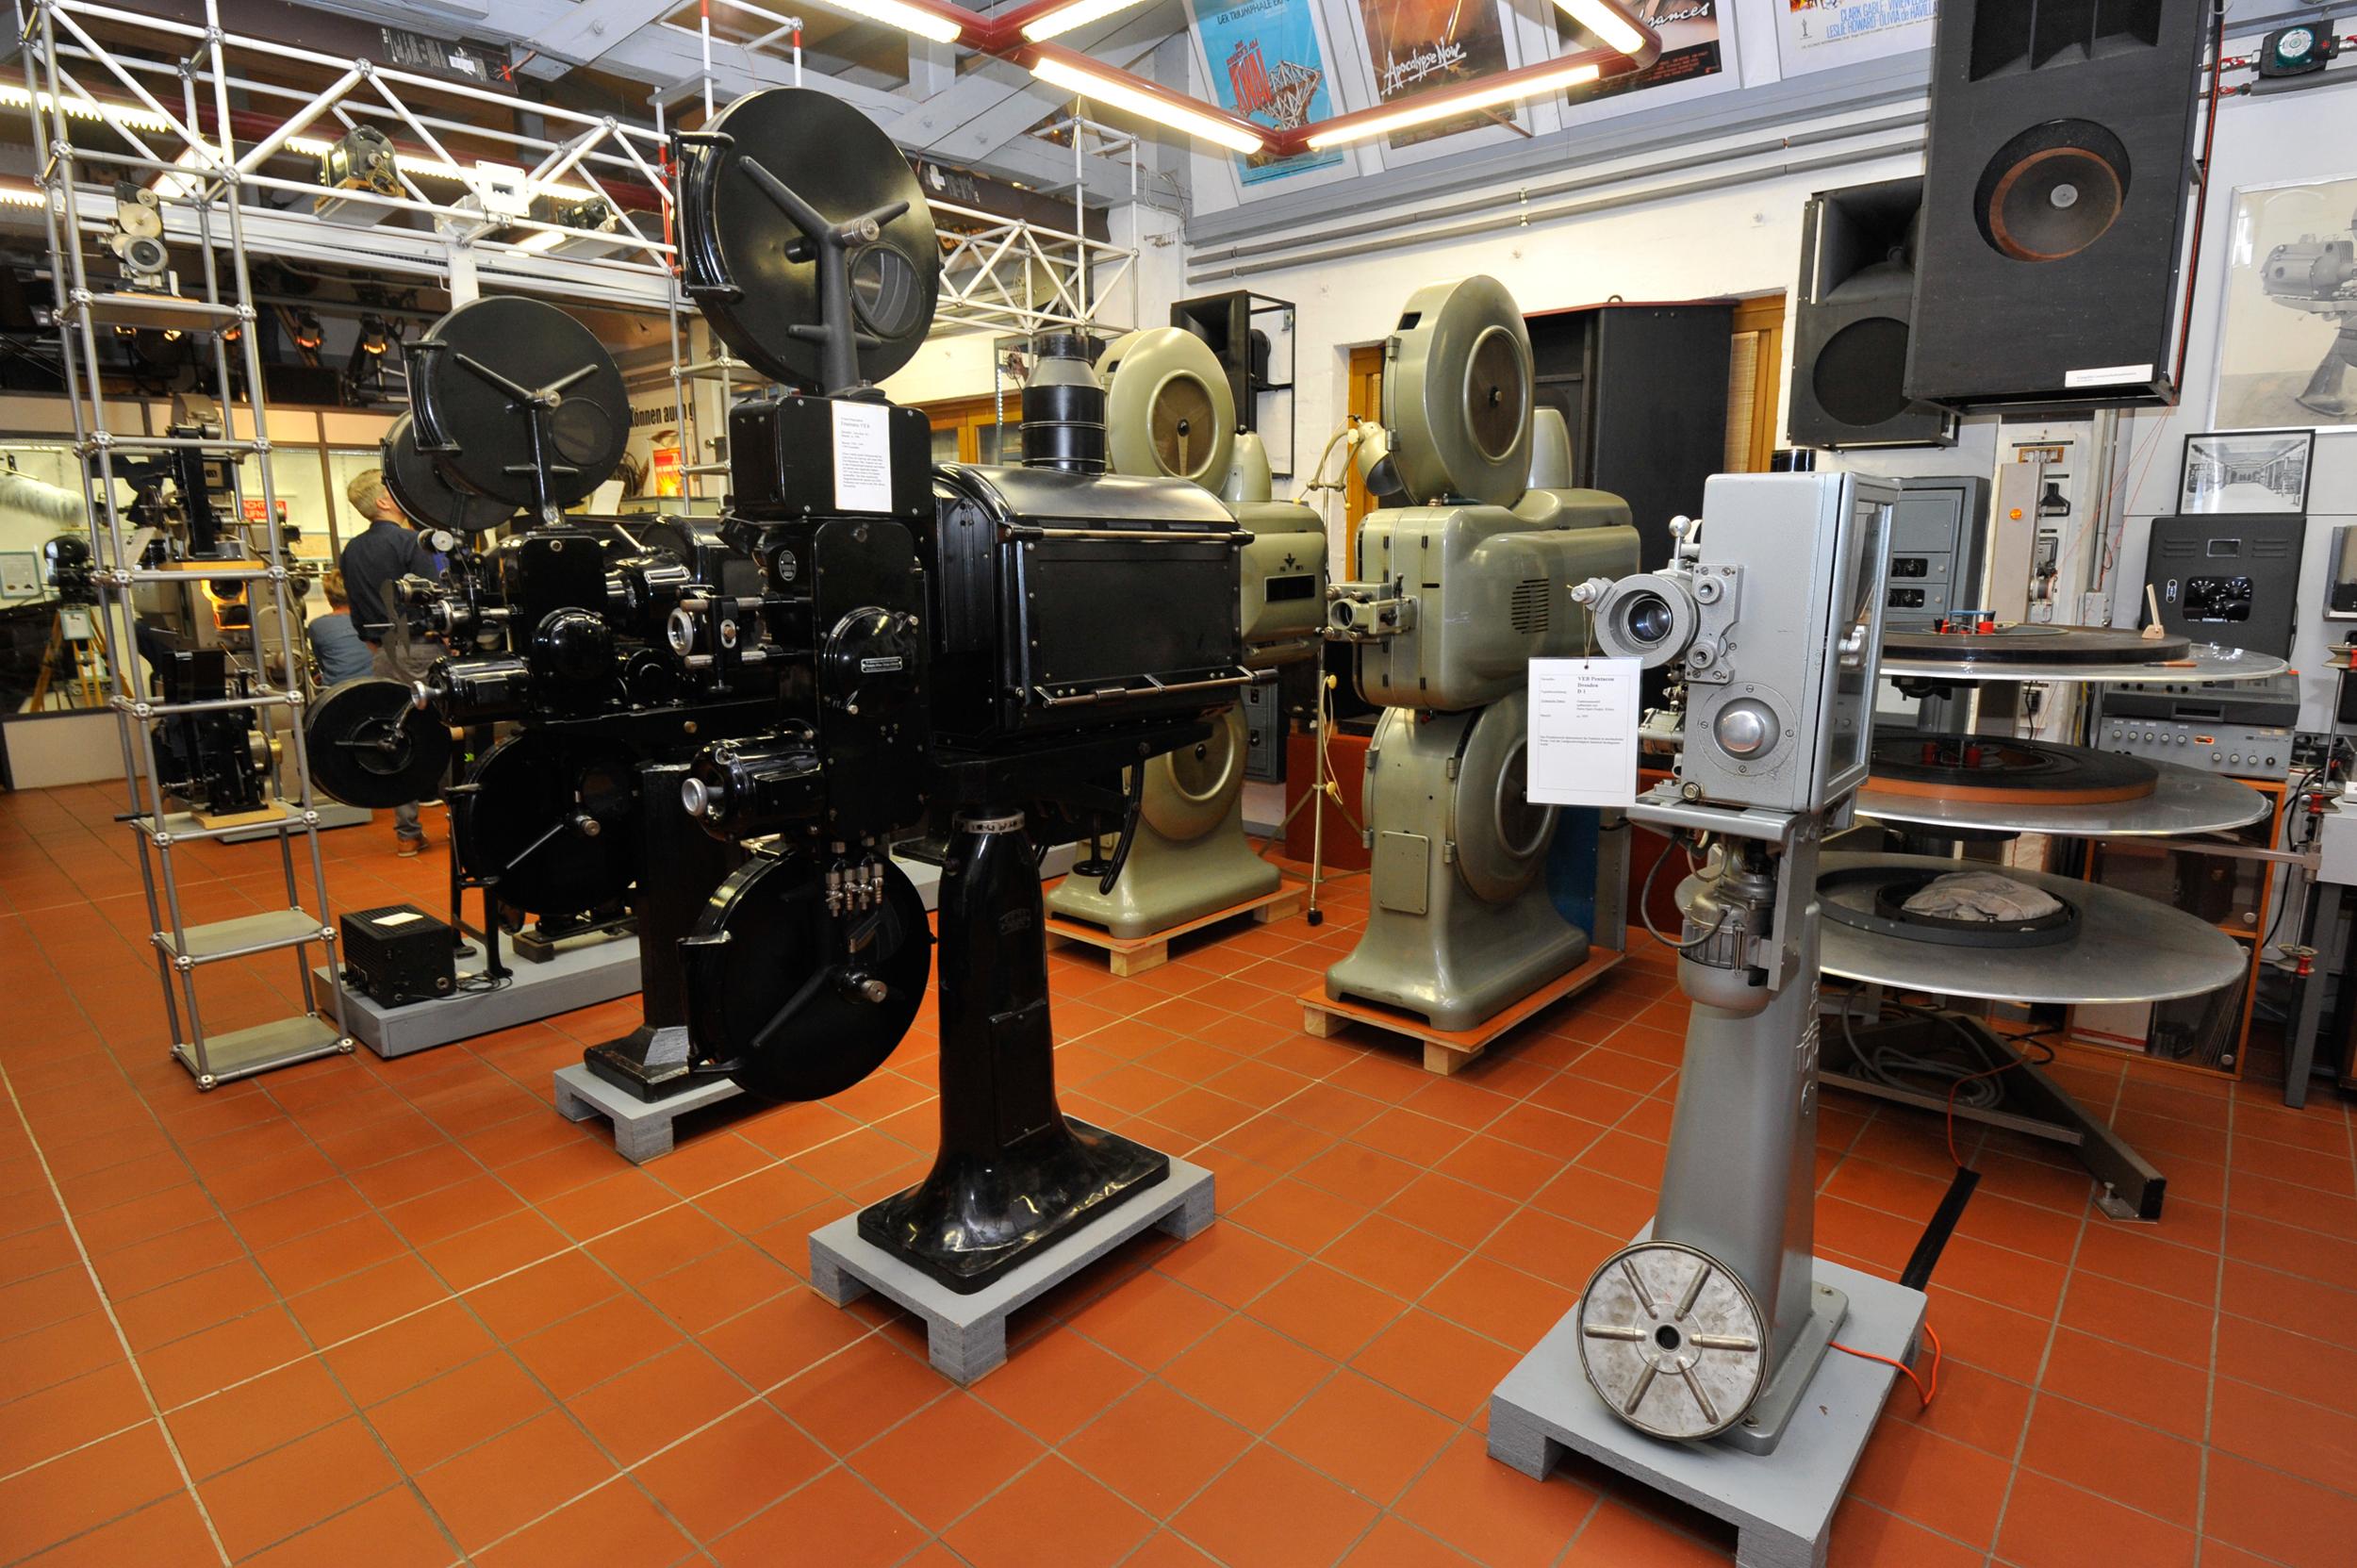 Kinogeschichte im Kinomuseum